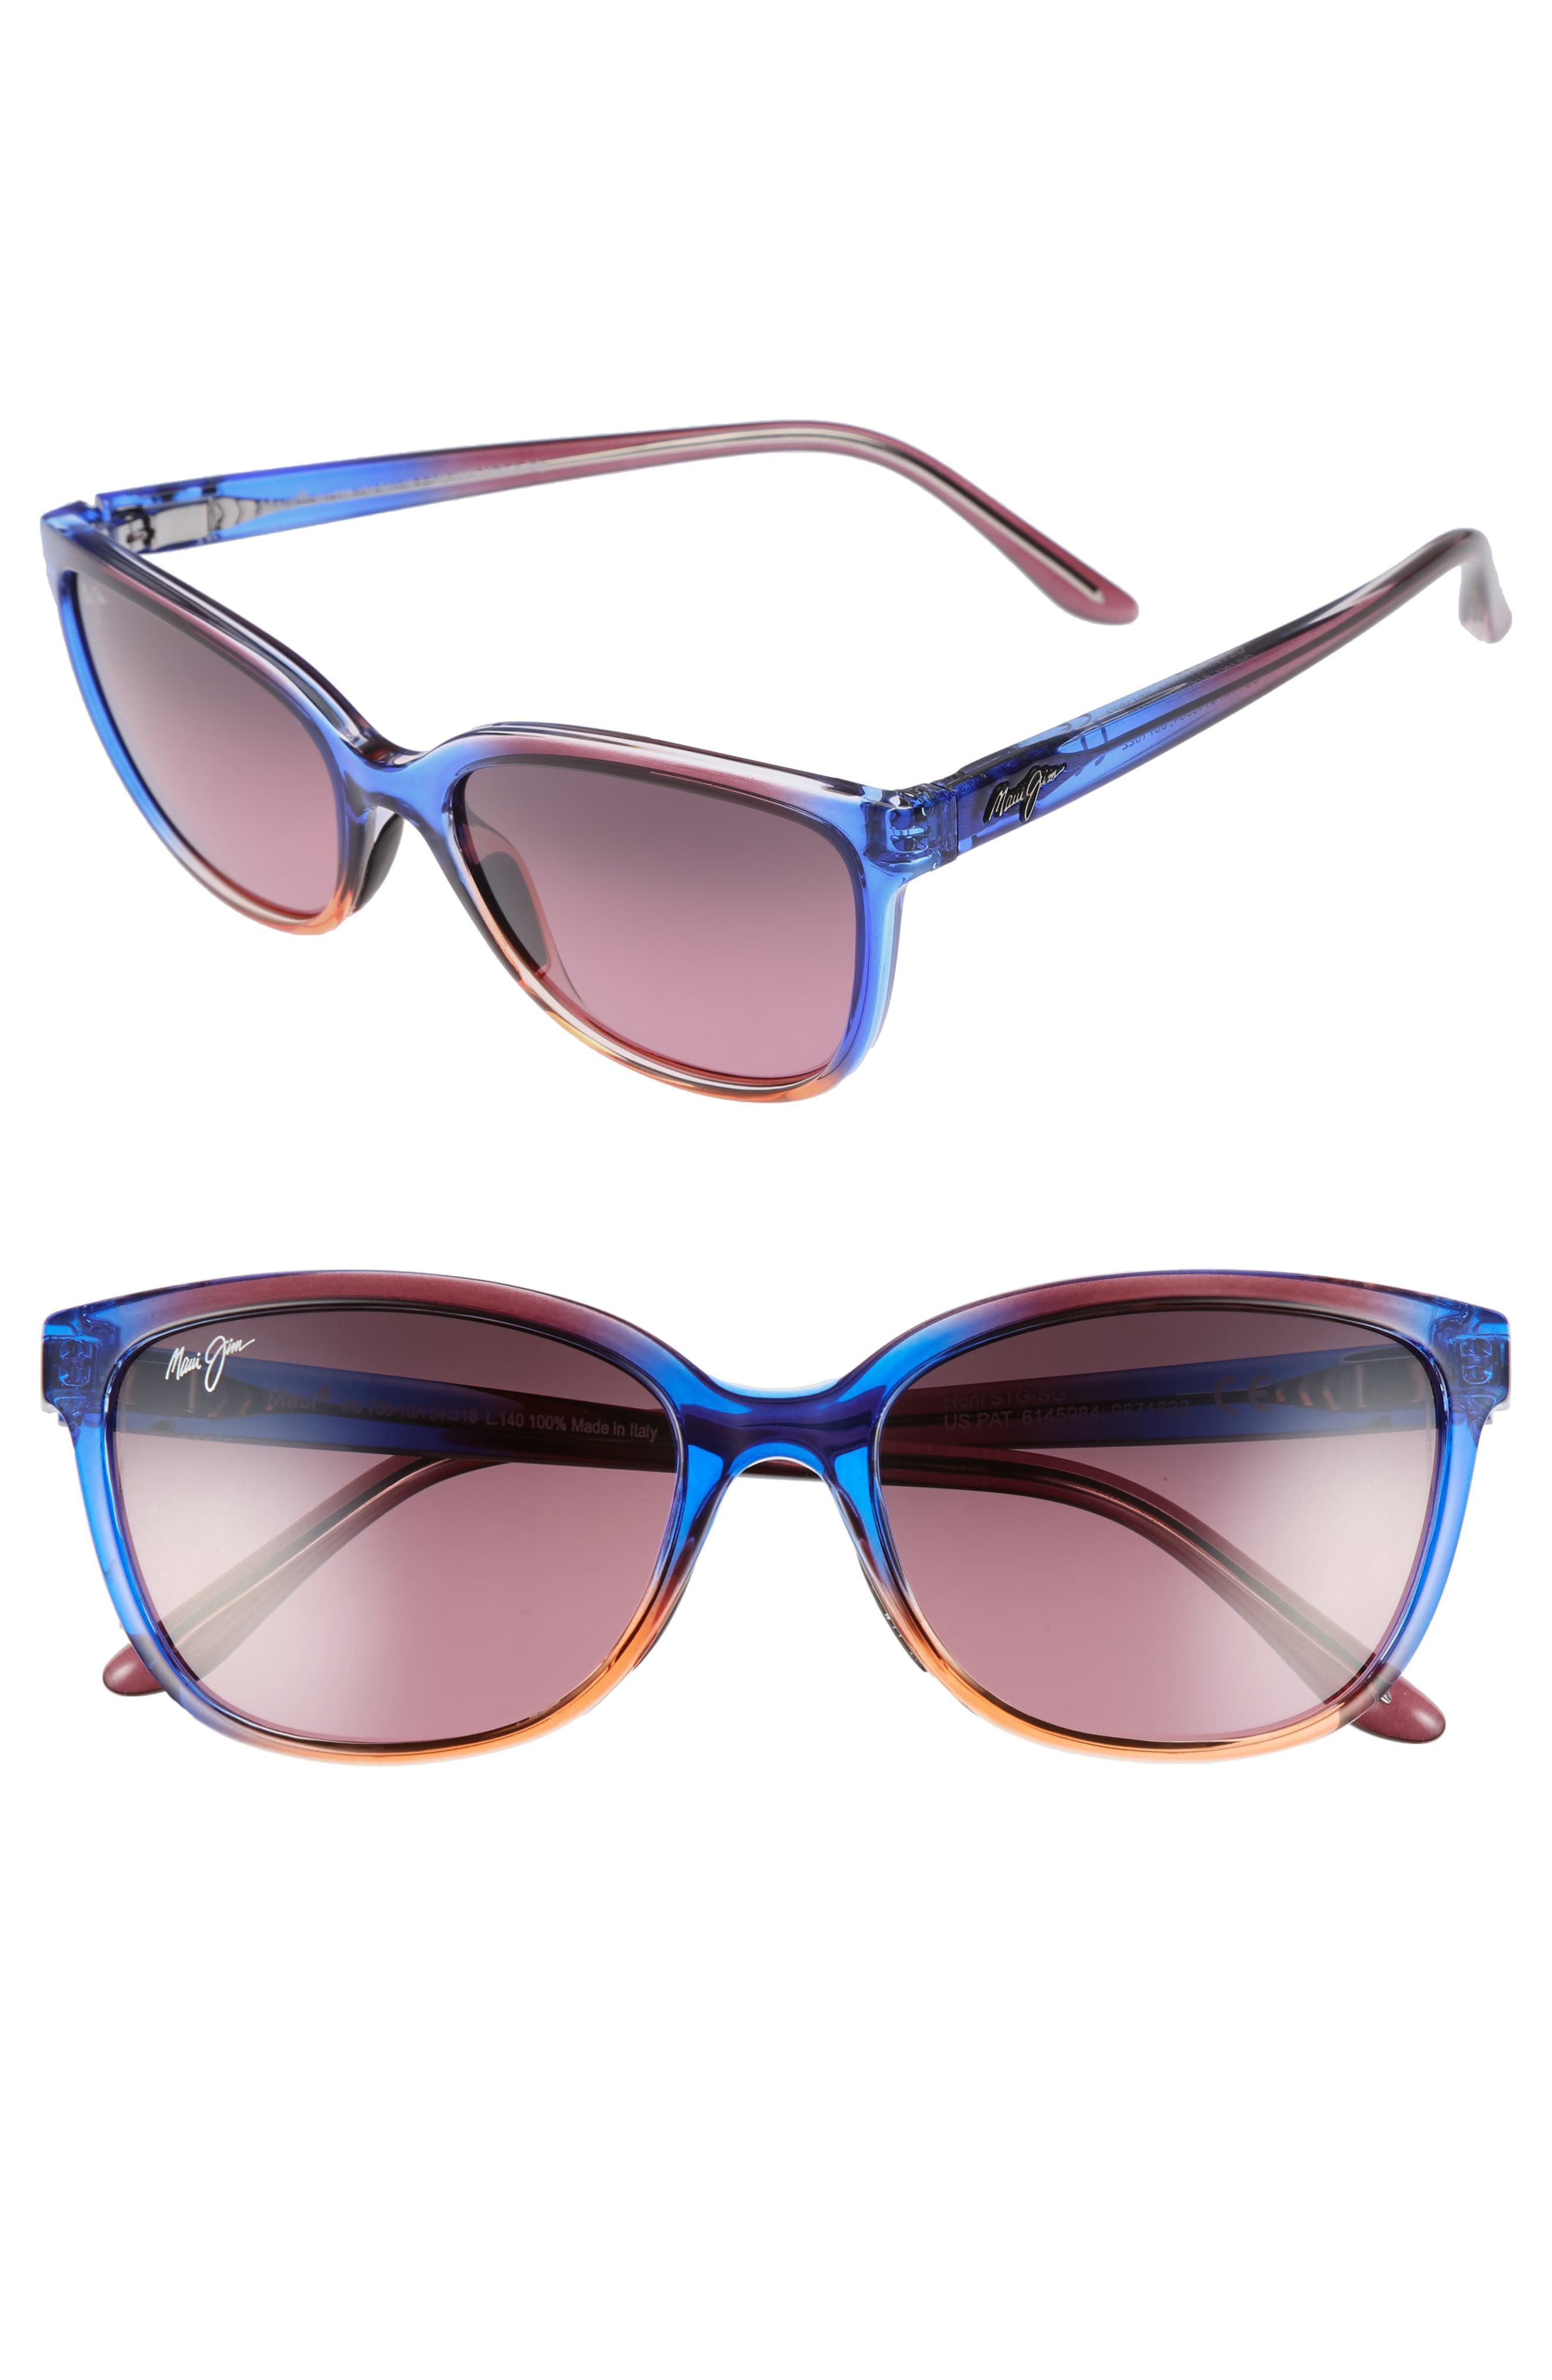 15c6fb2bf573 Maui Jim Honi 54mm Polarized Cat Eye Sunglasses in 2019 | Products ...